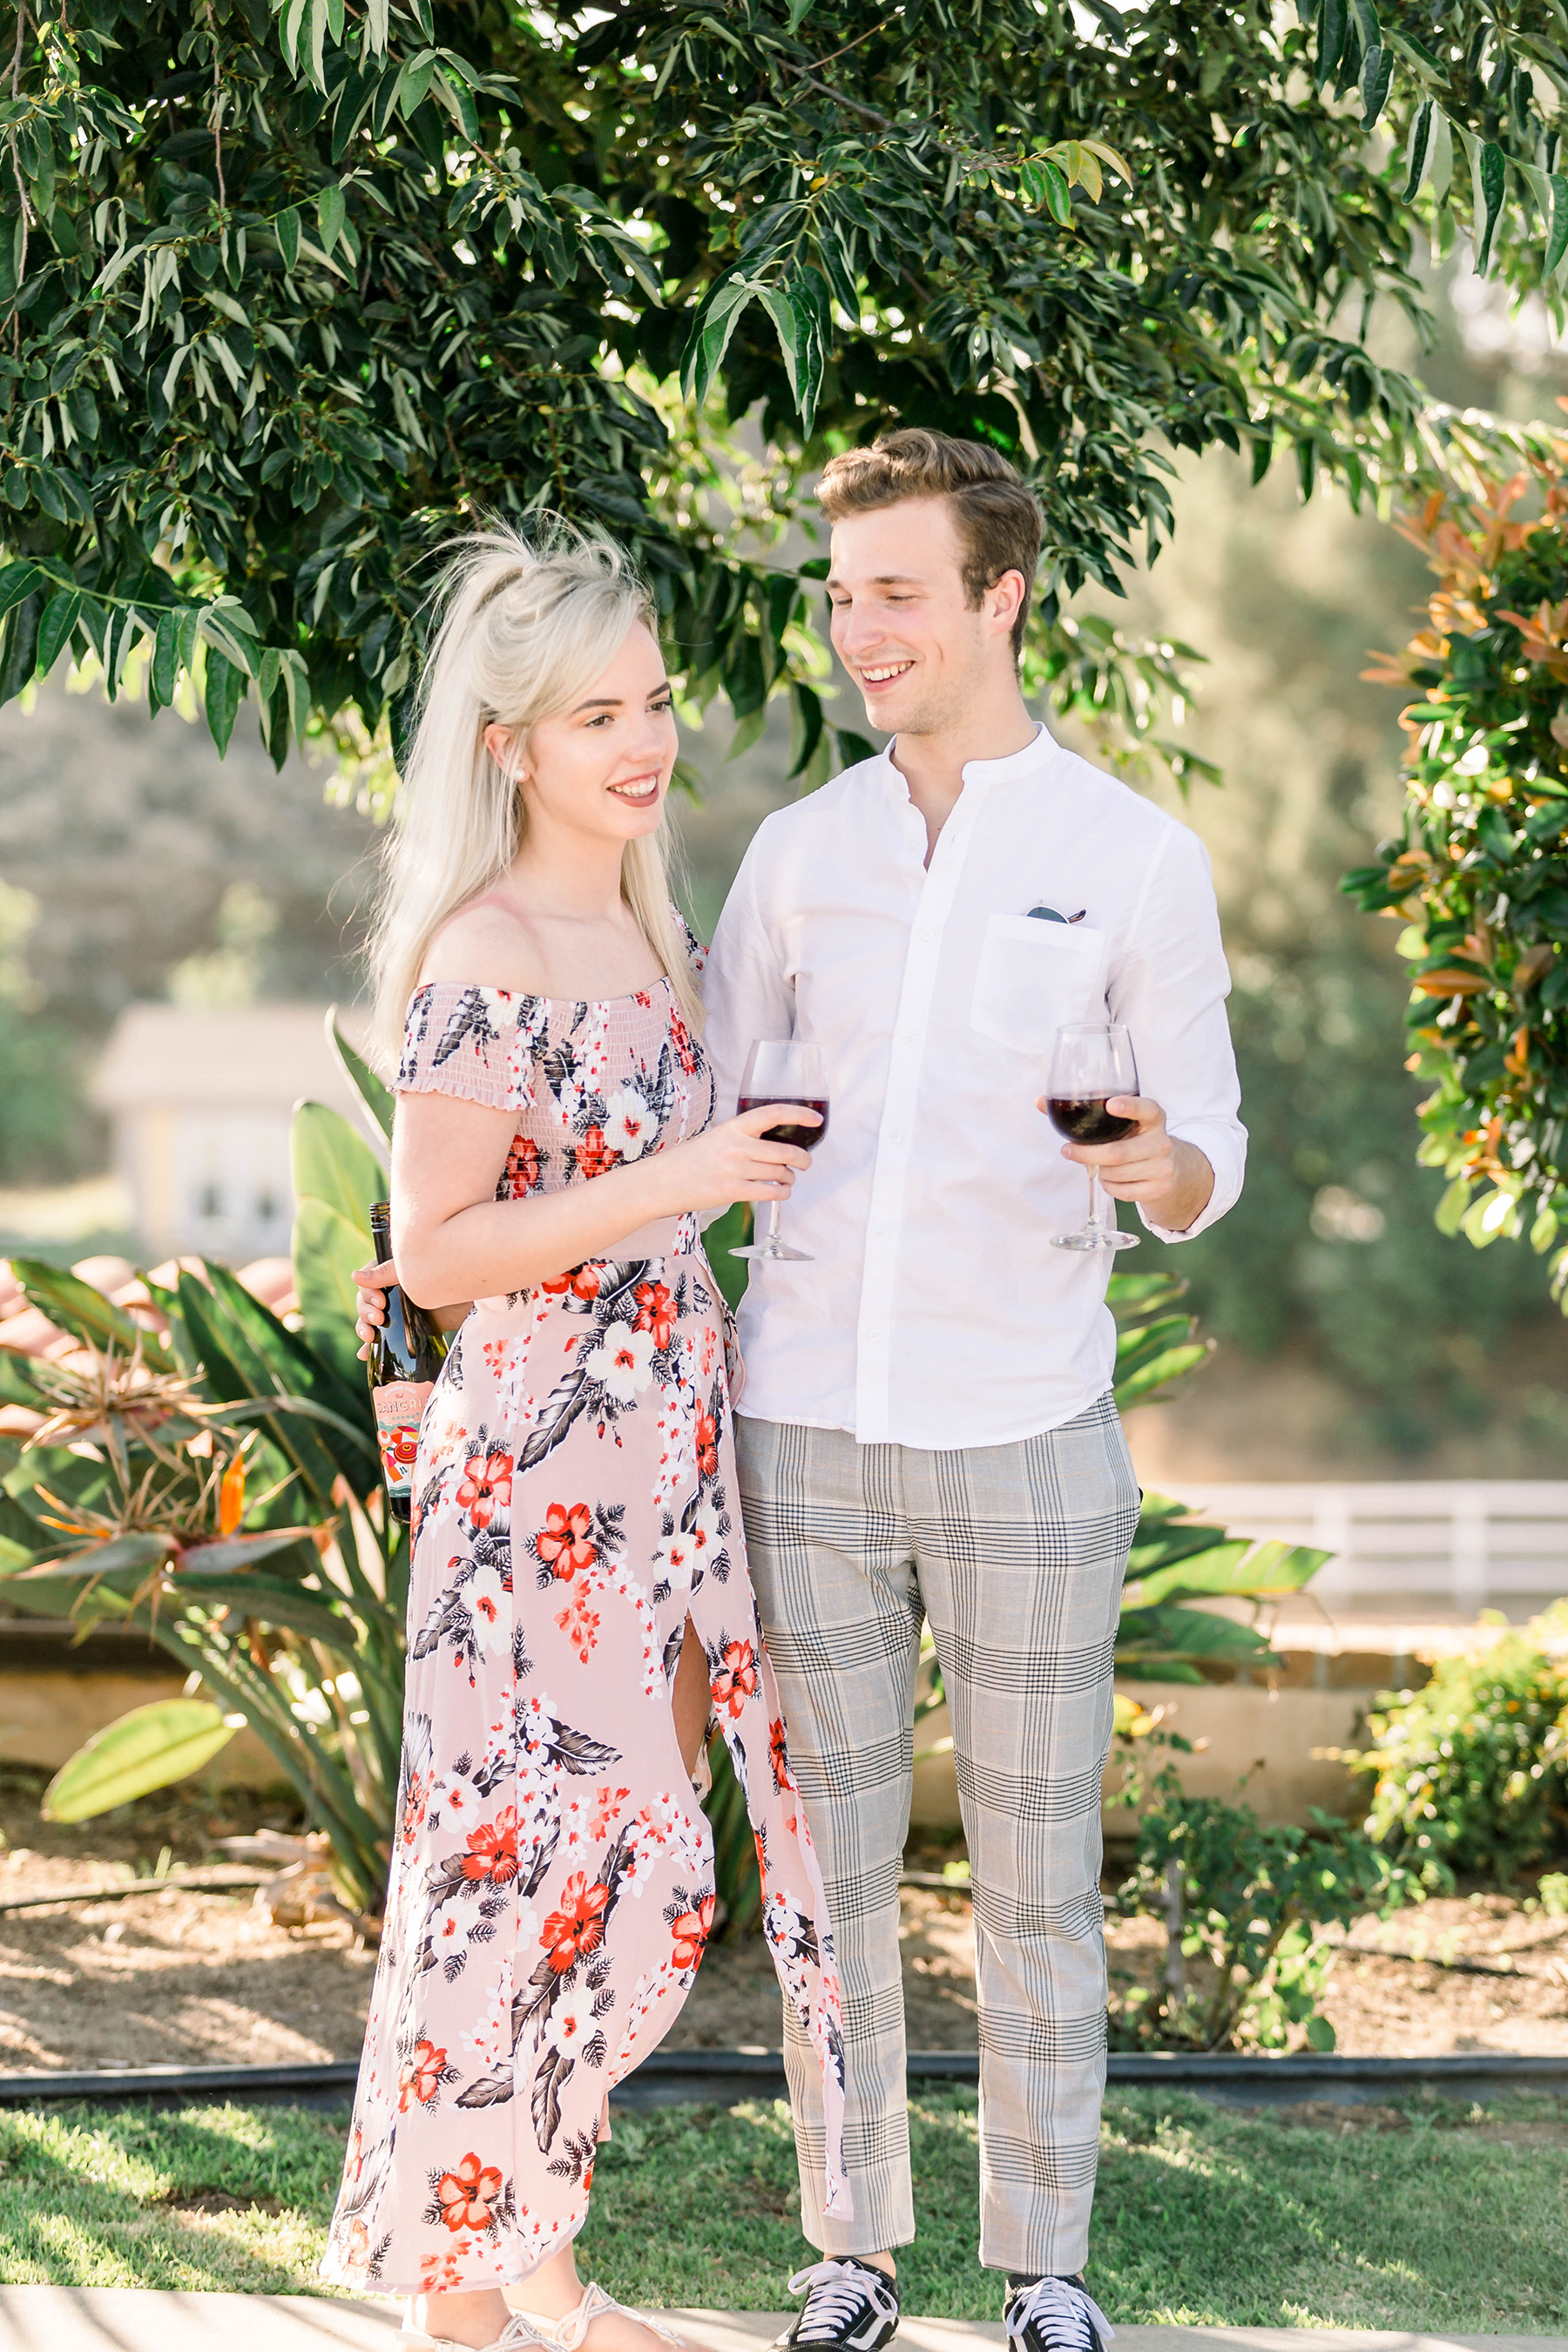 Sweet Vineyard Proposal in California Janita Mestre02